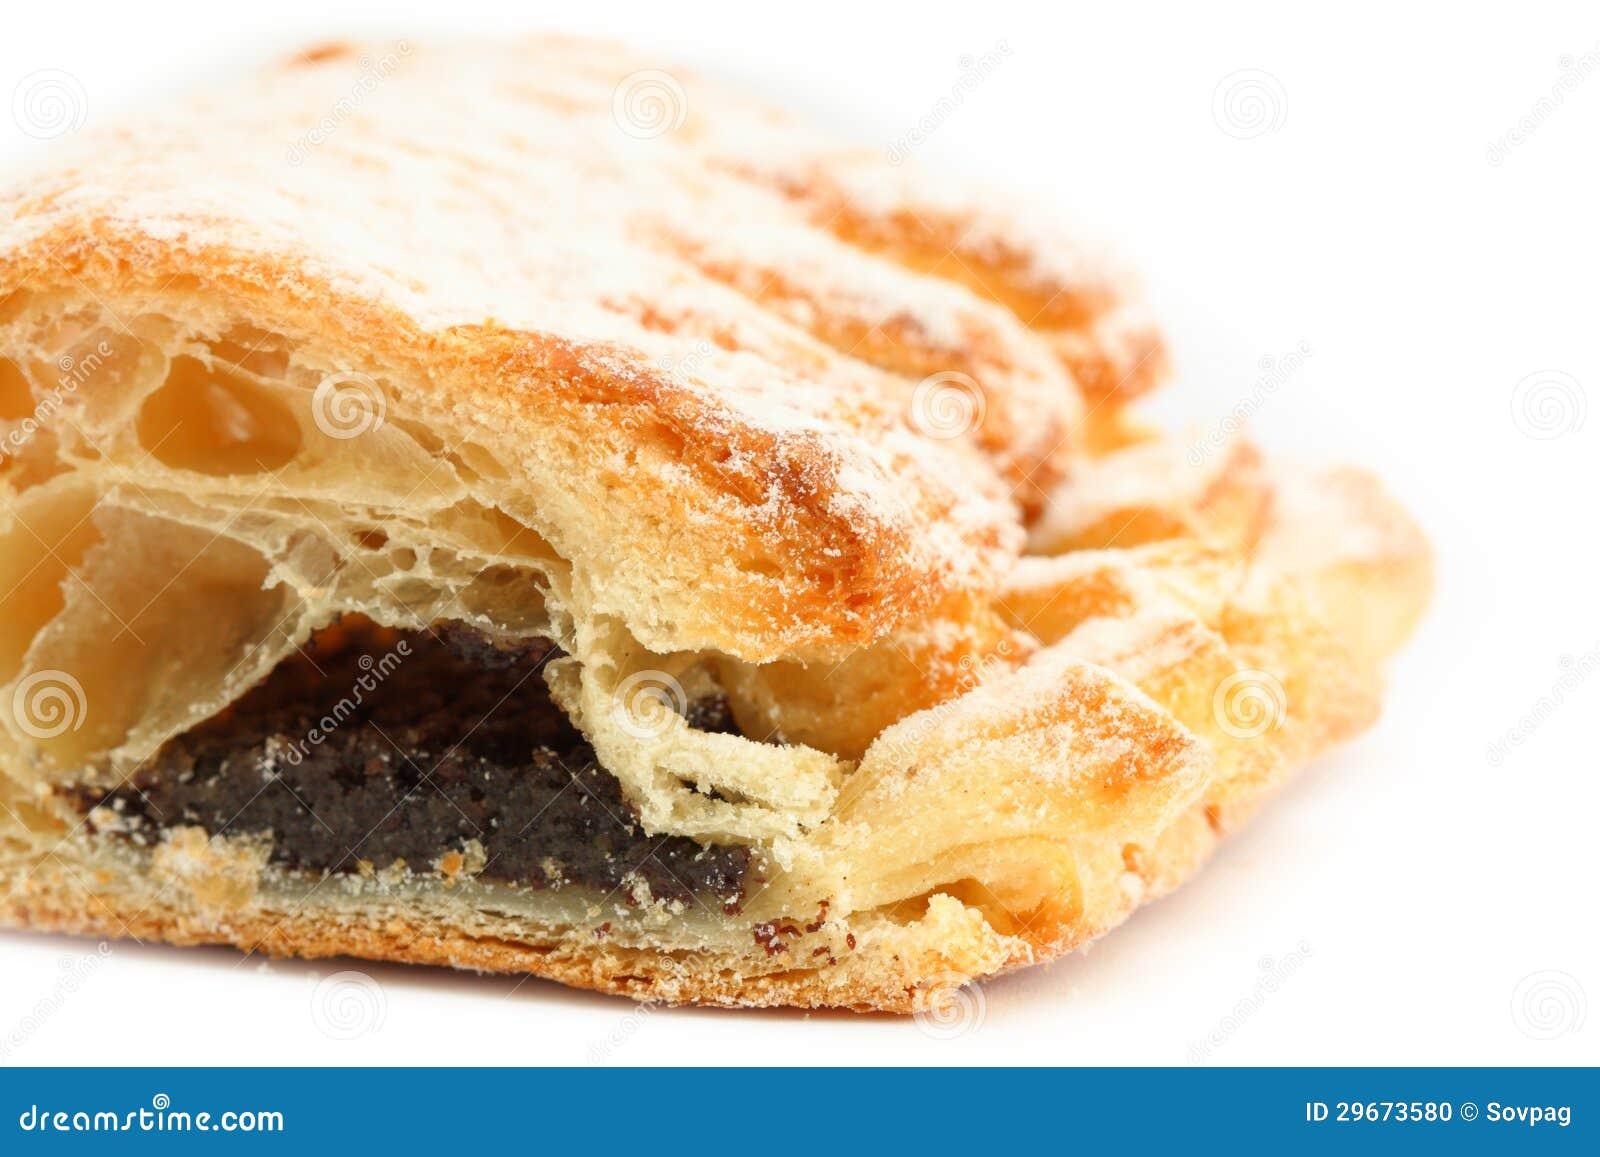 Zoet die broodje met papaverzaad wordt gevuld